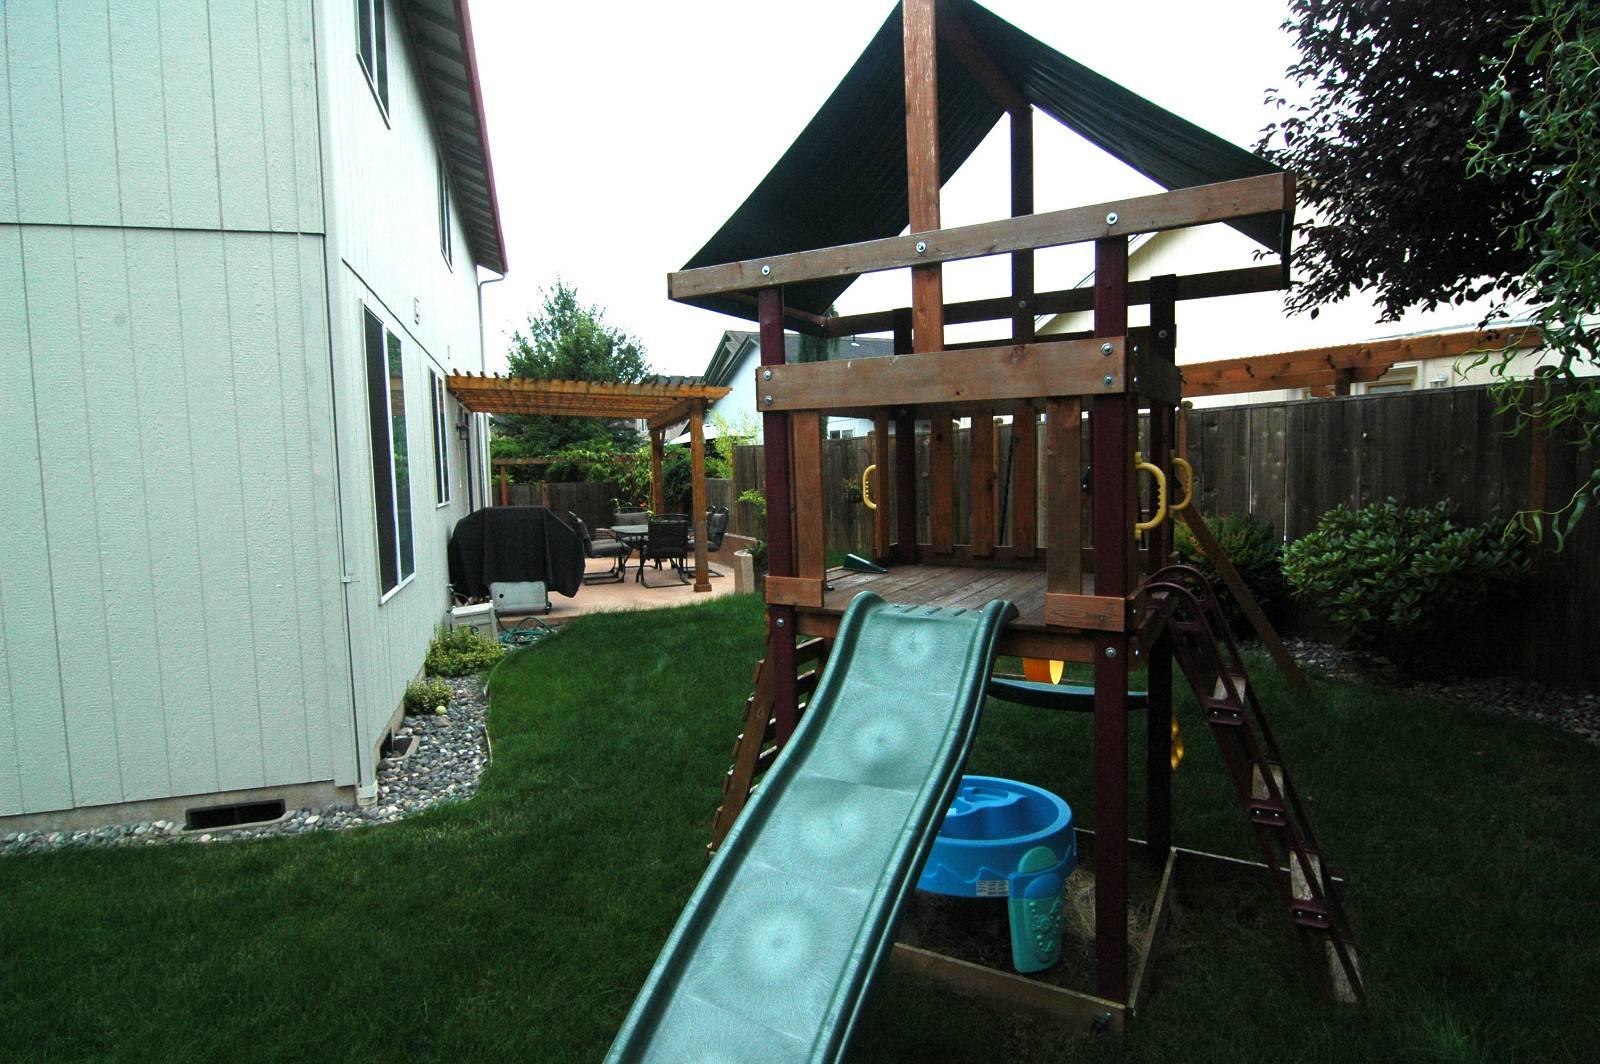 Do it yourself garden design - Landscape Design In A Day